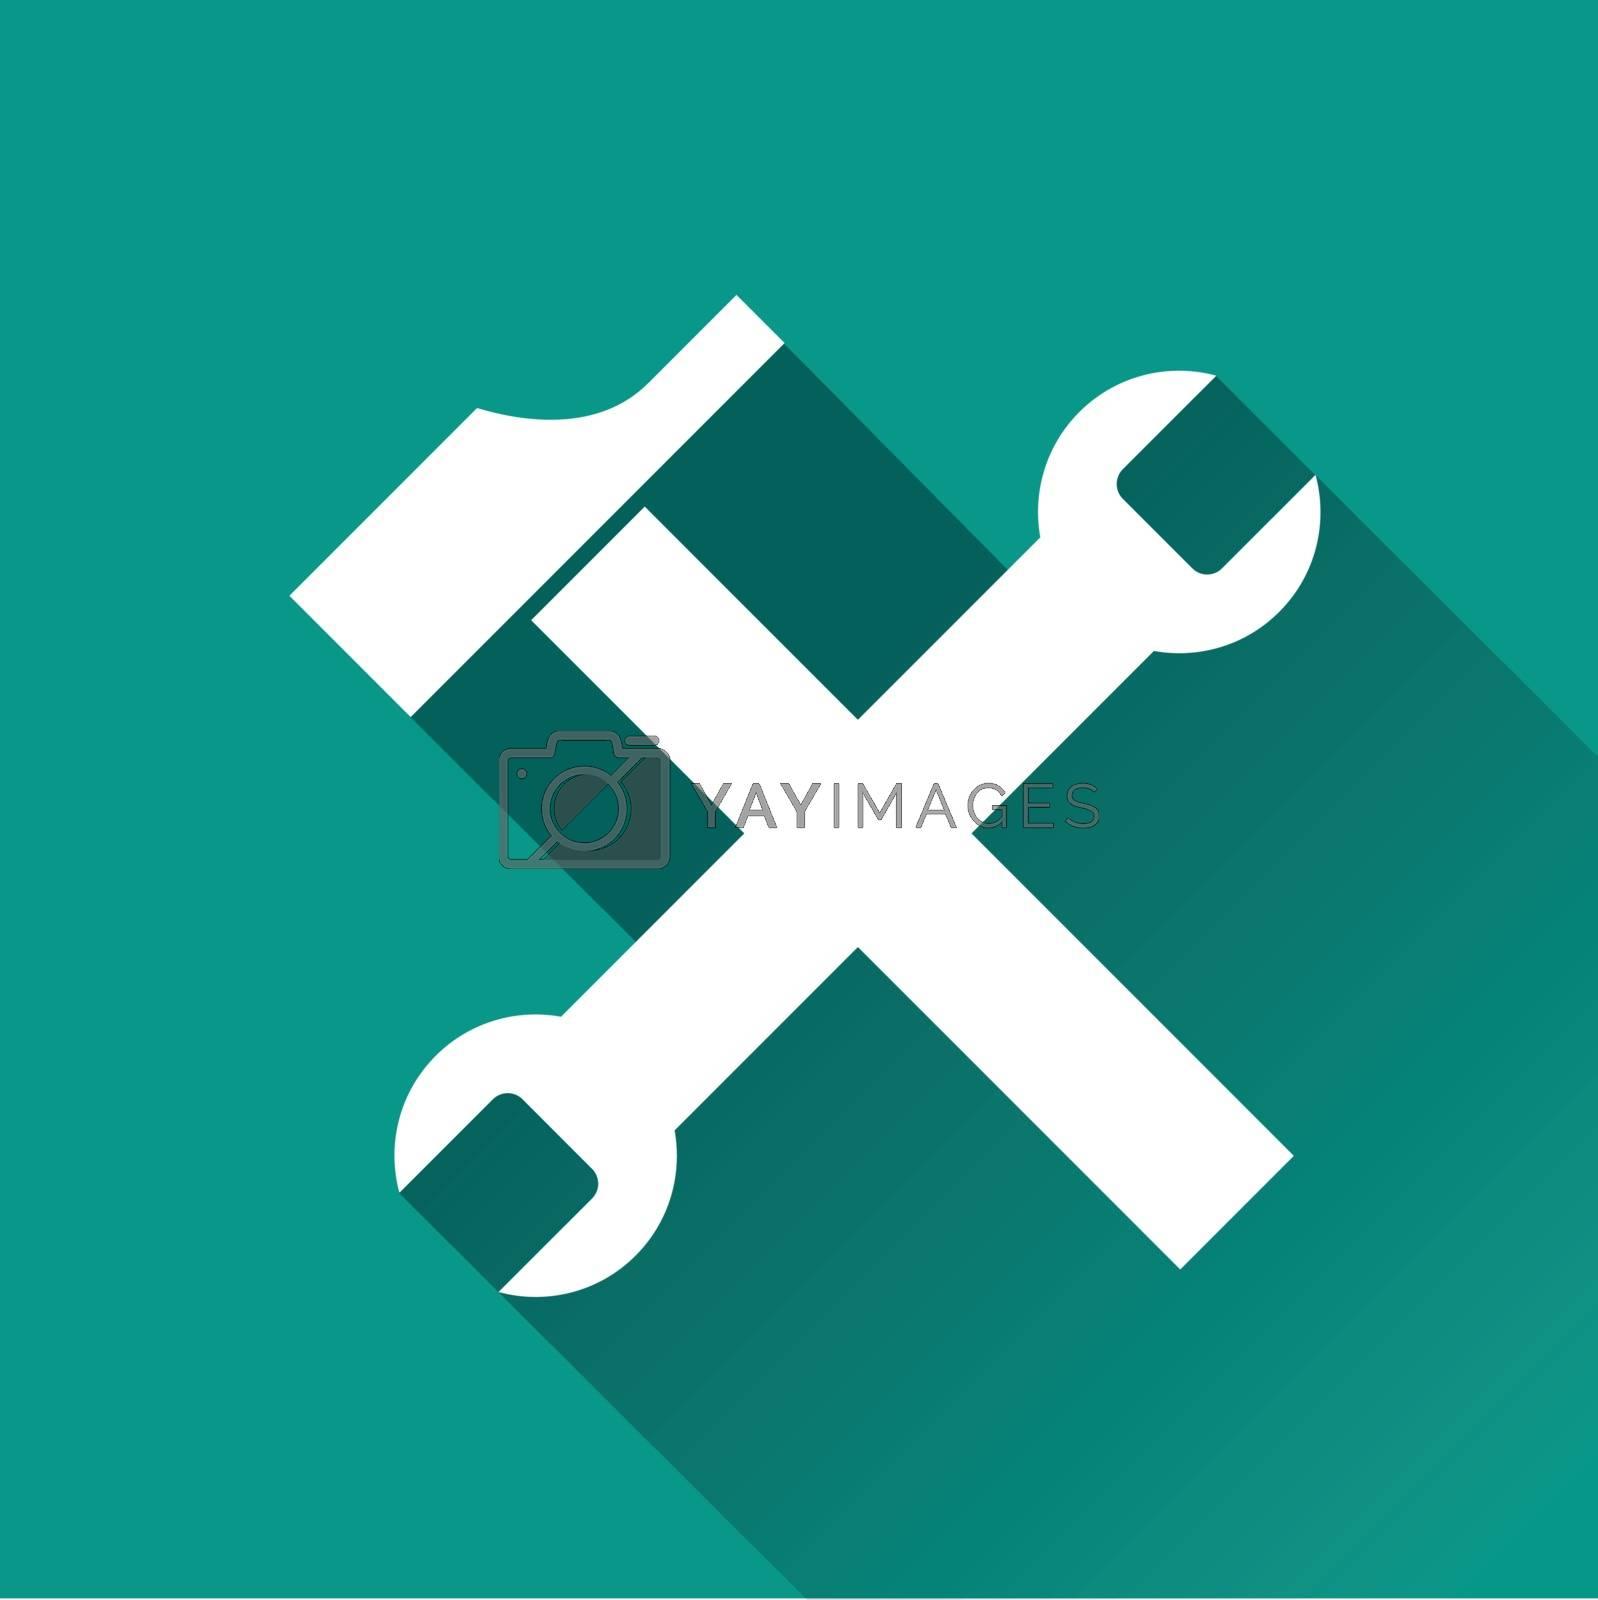 illustration of tools flat design icon isolated